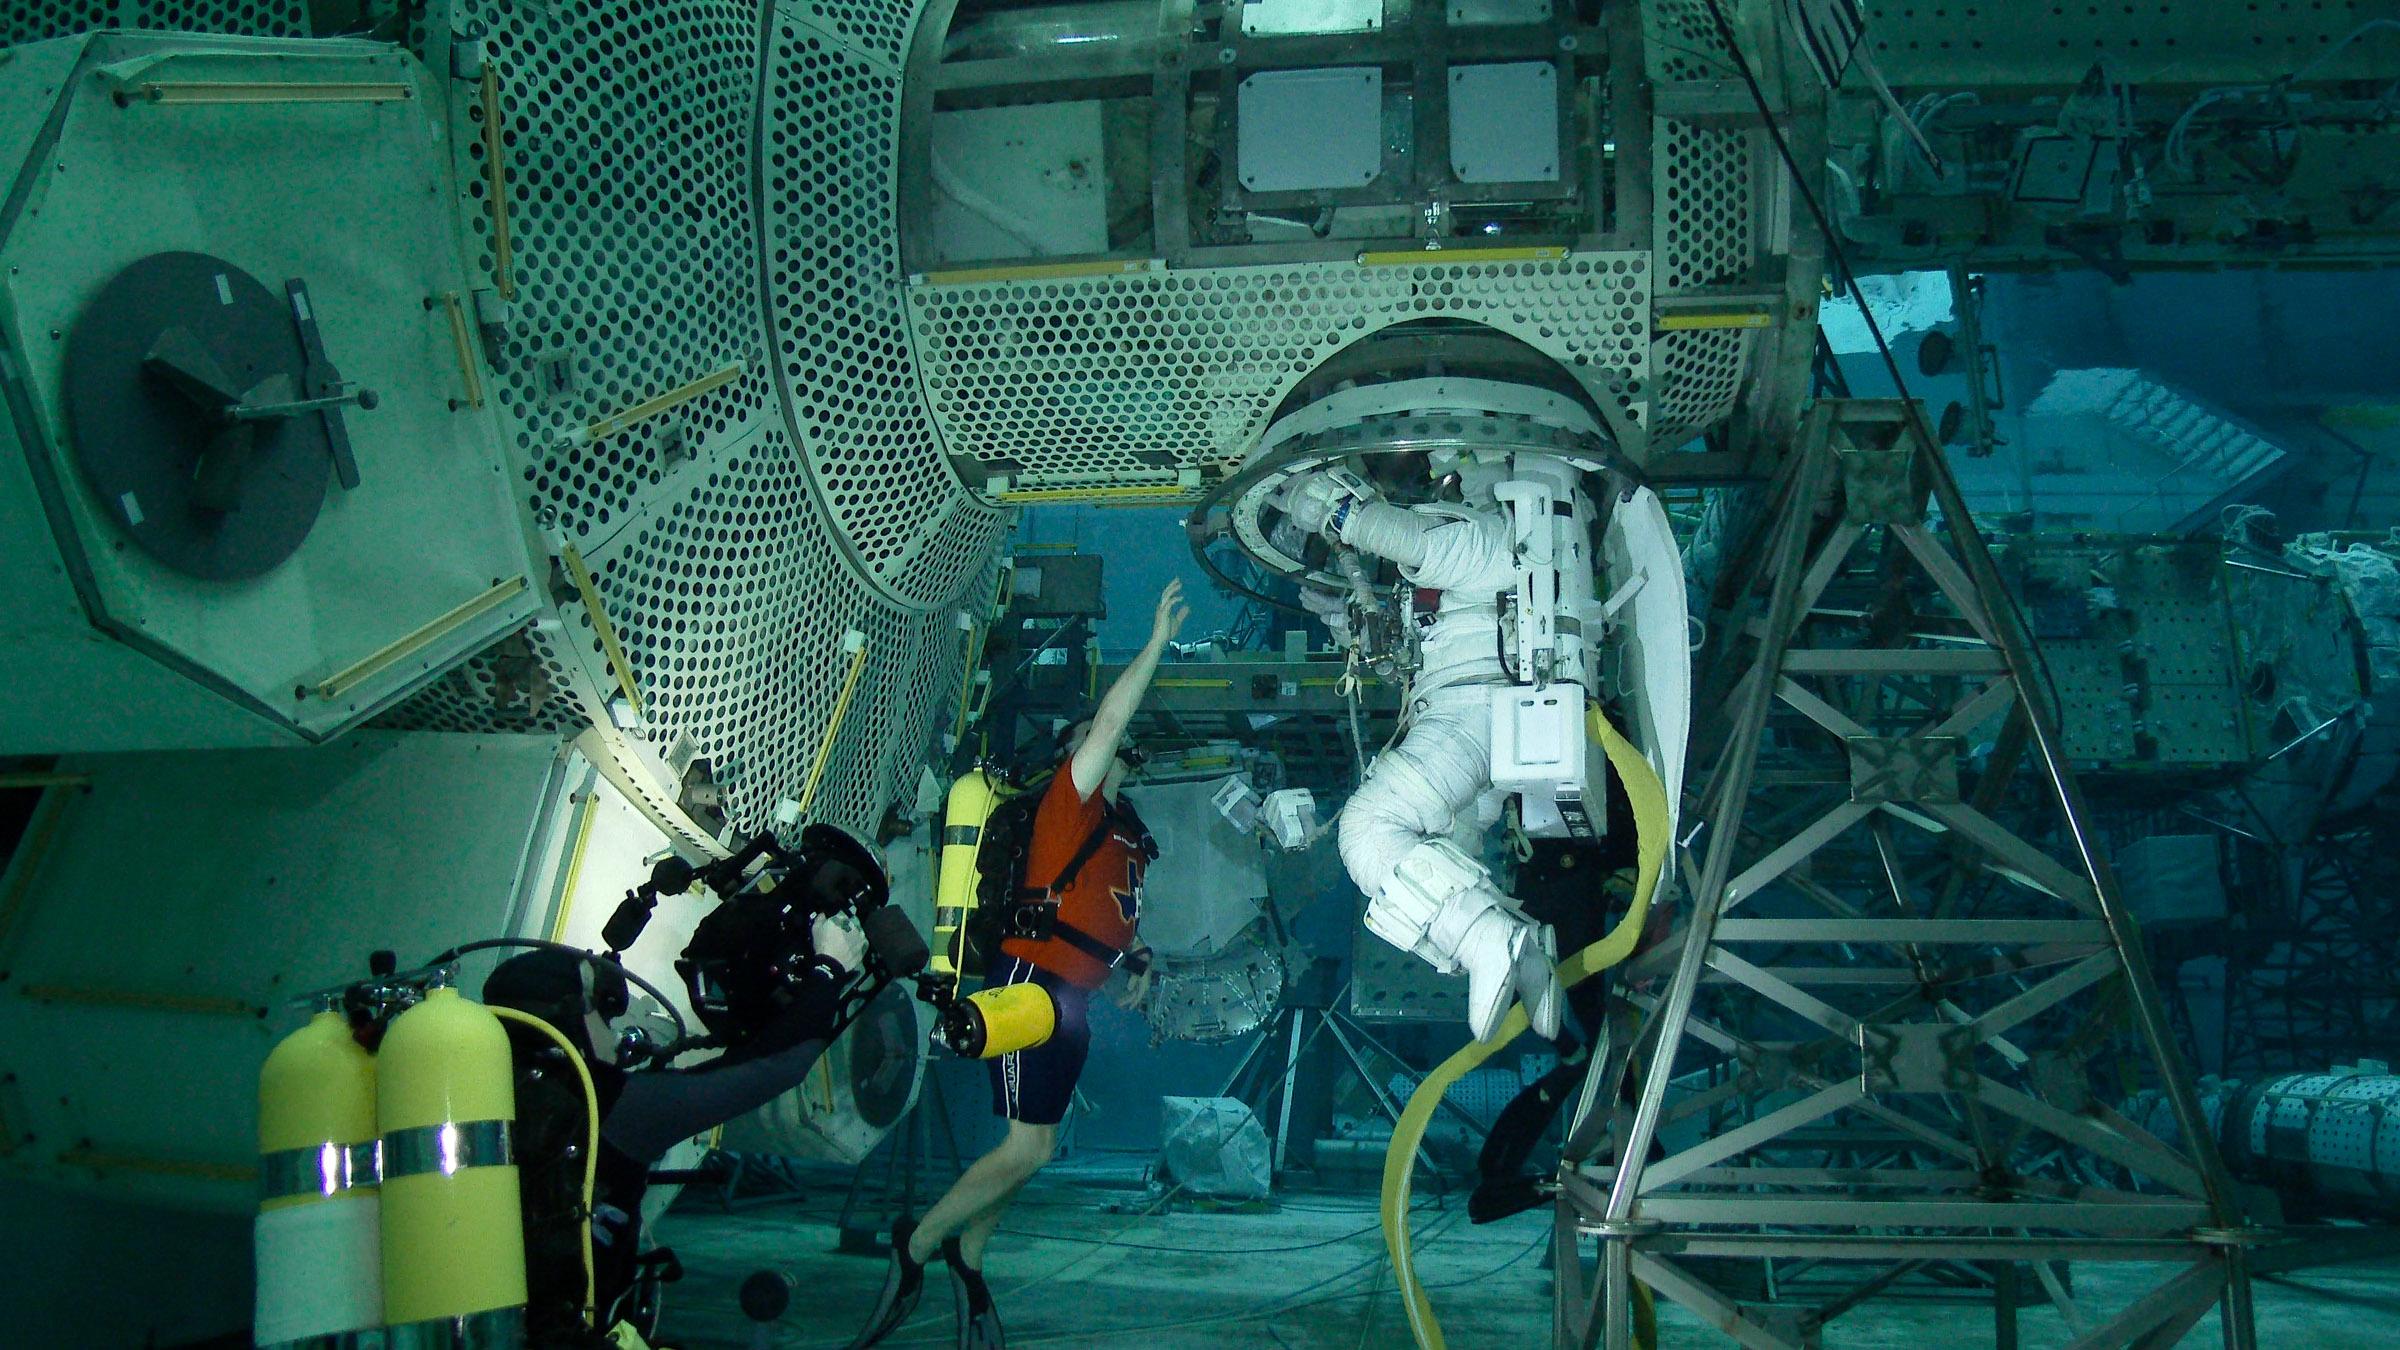 astronaut   Wyoming / Kentwood Now